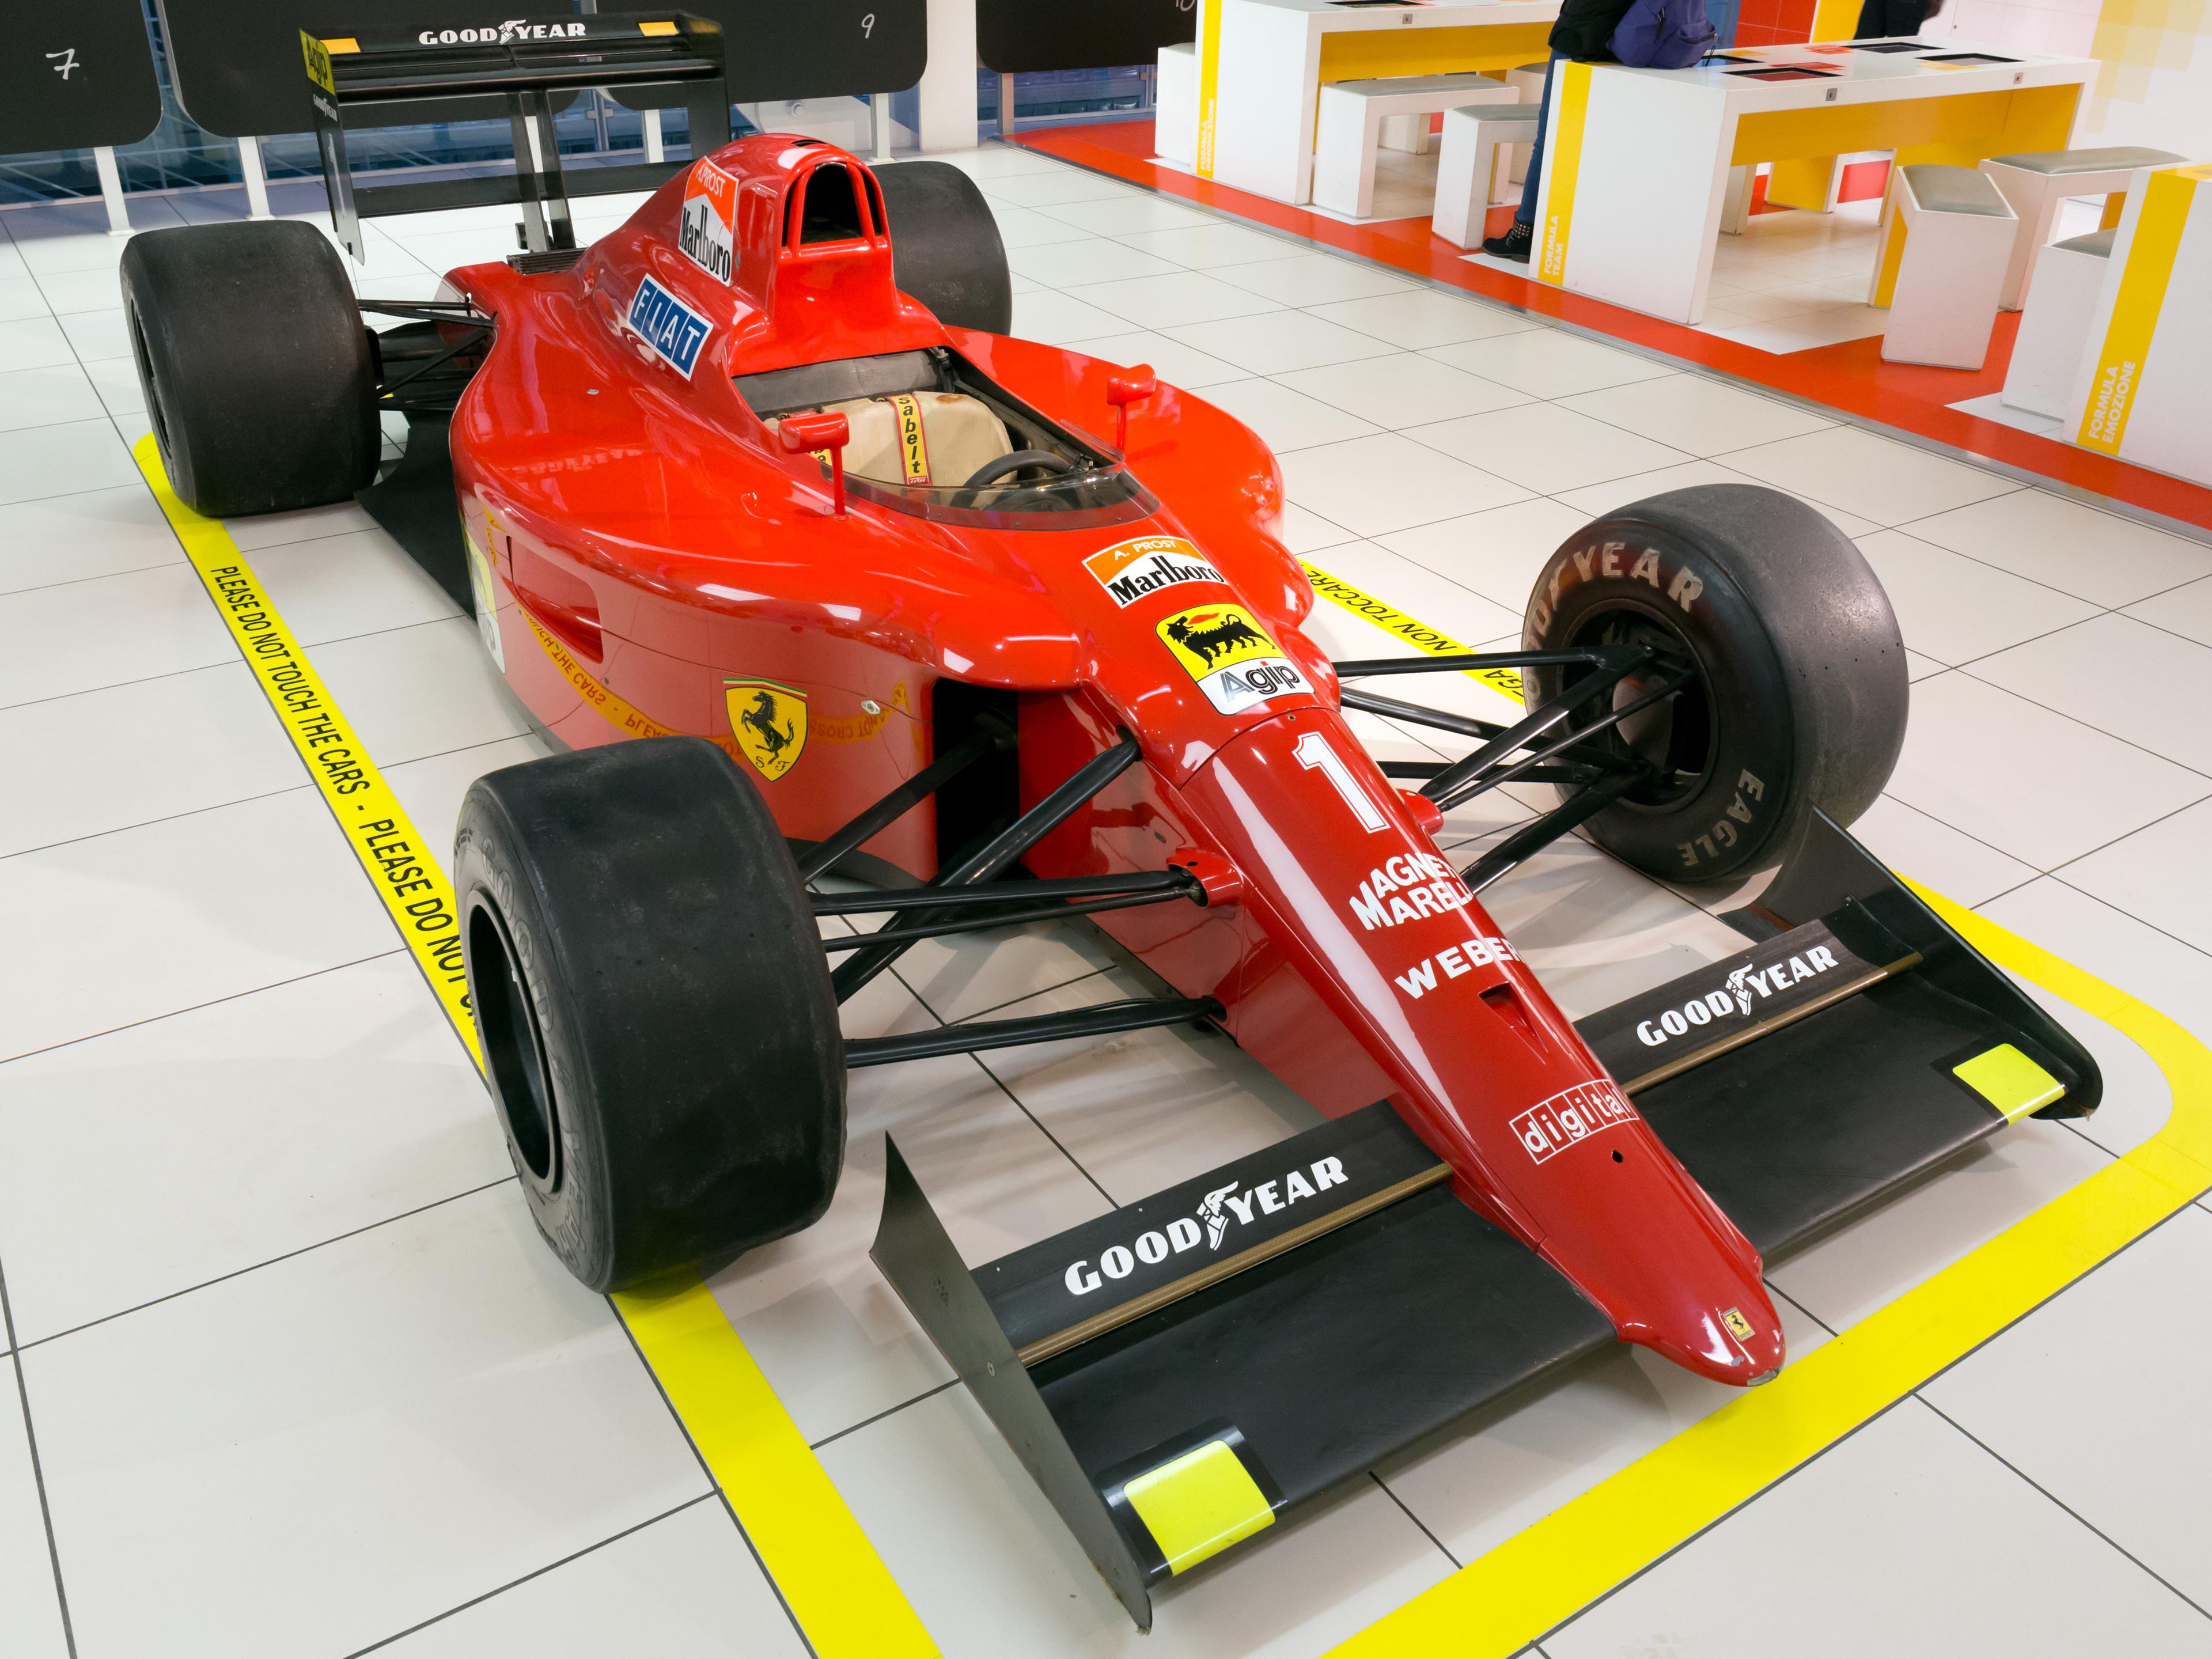 File:Ferrari 641-2 front-right Museo Ferrari.jpg